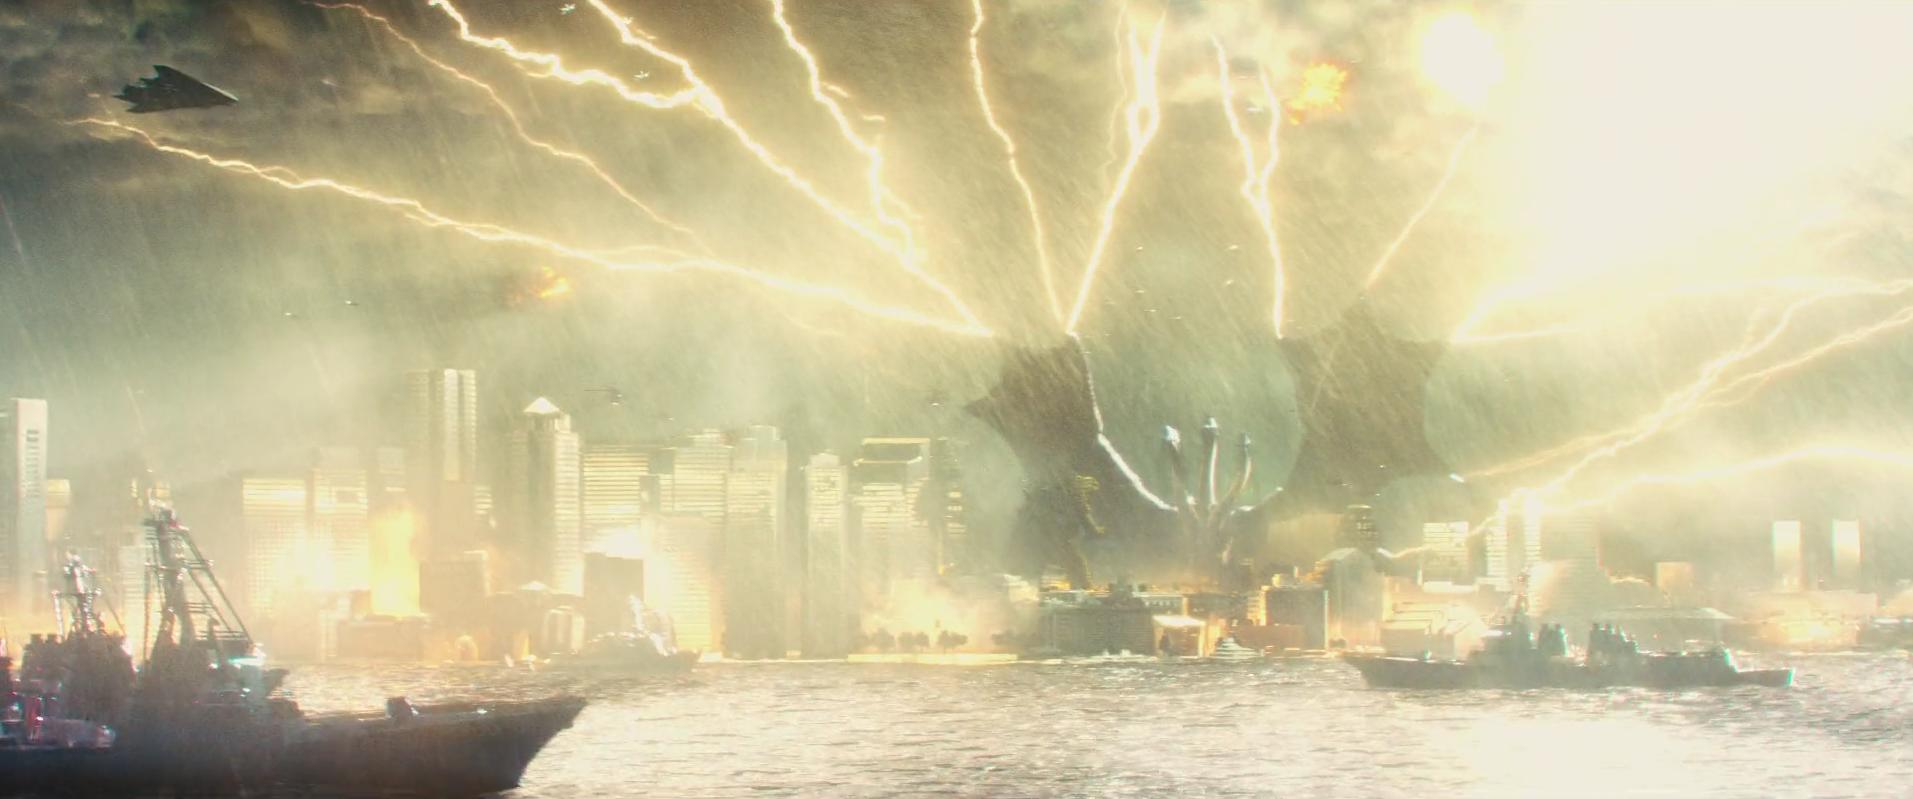 30 - Ghidorah Lightning Storm attack.png